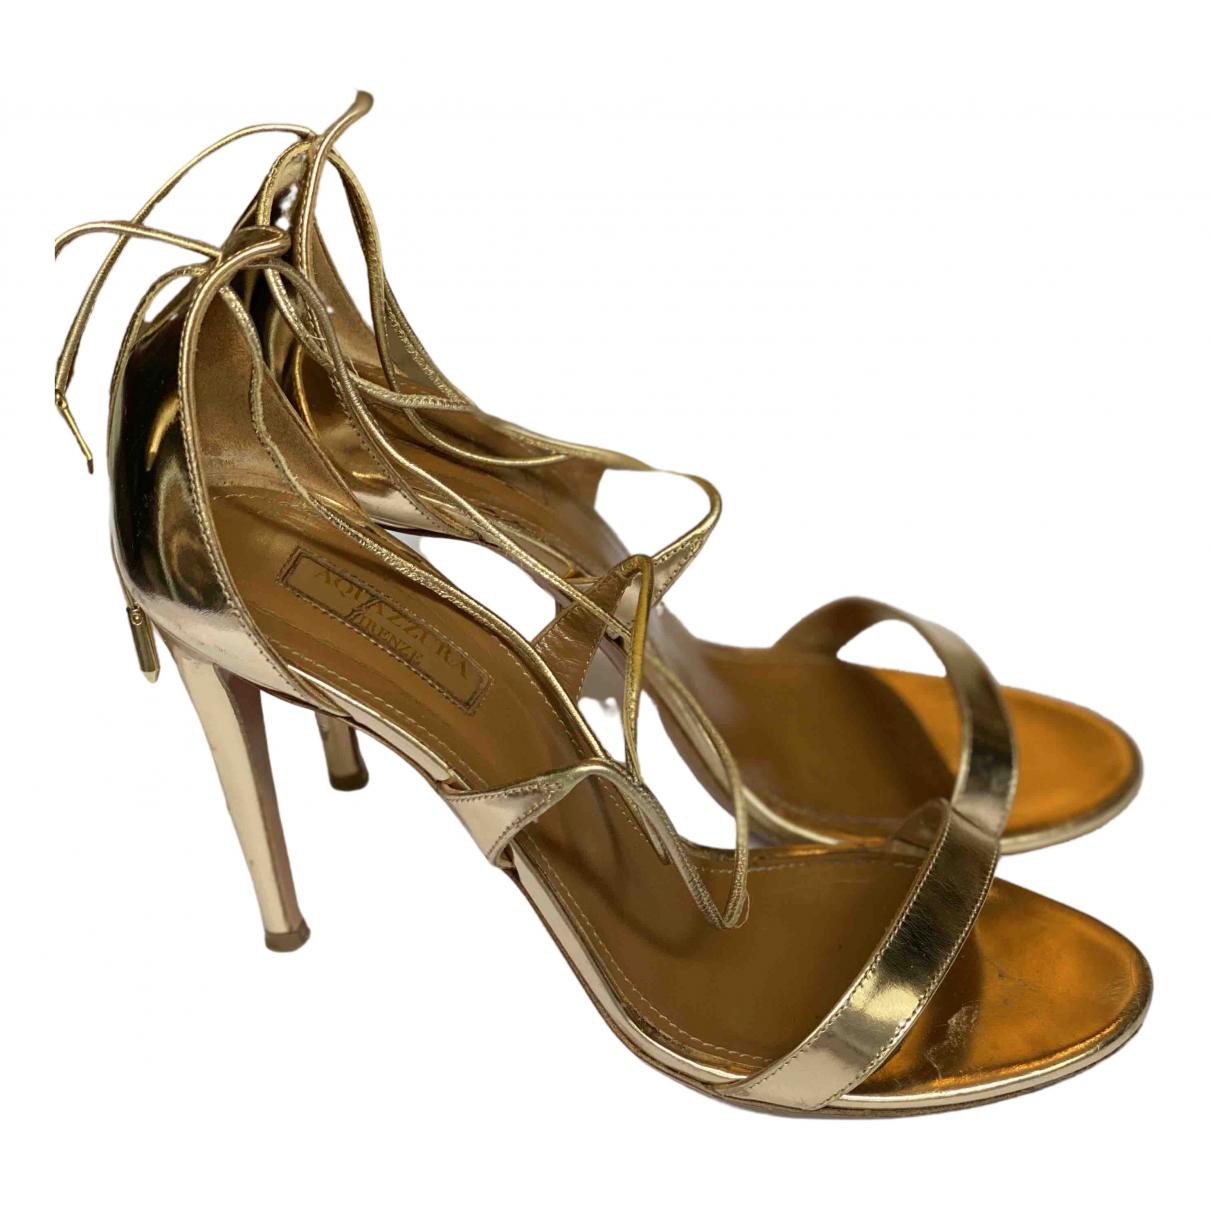 Aquazzura \N Gold Leather Sandals for Women 38 EU